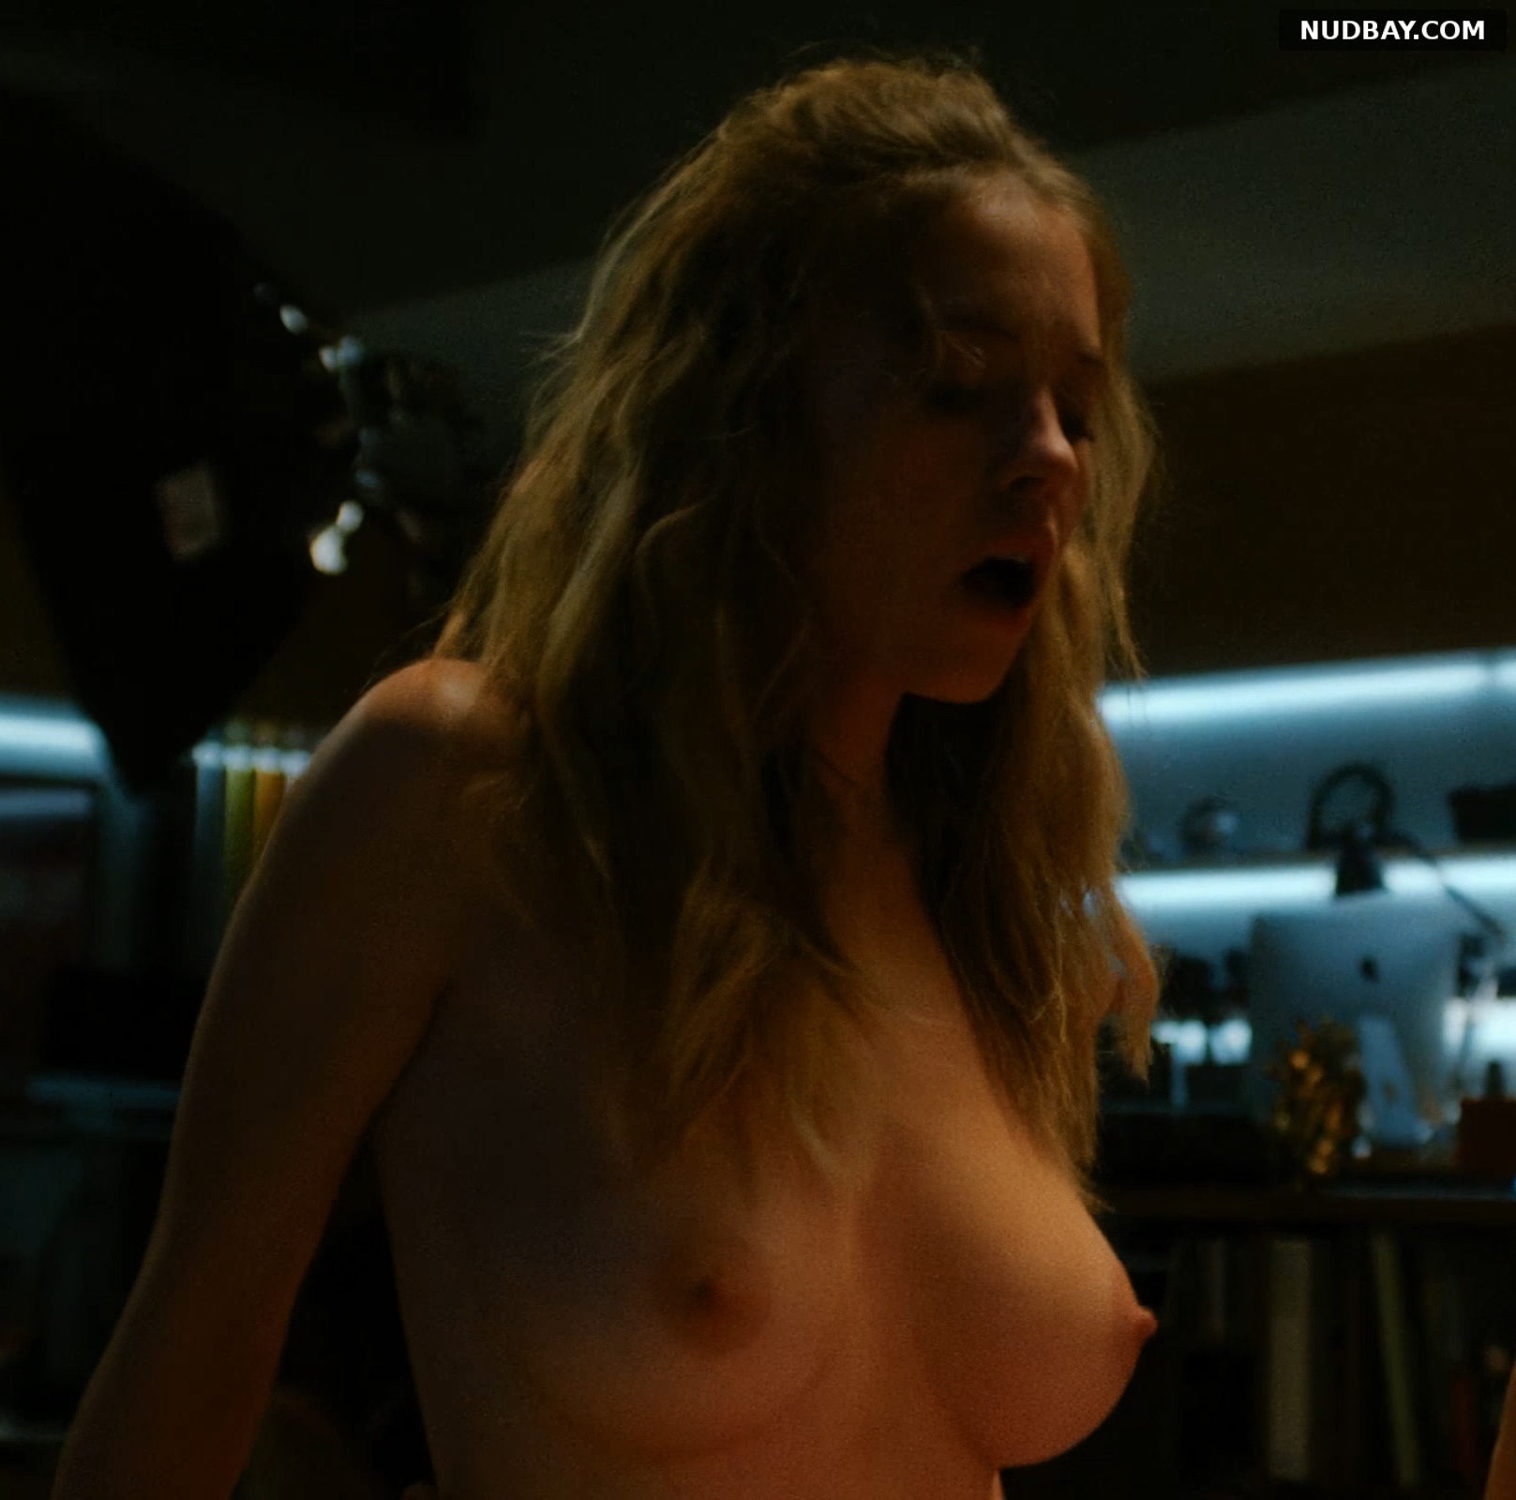 Sydney Sweeney nude in the movie The Voyeurs (2021)